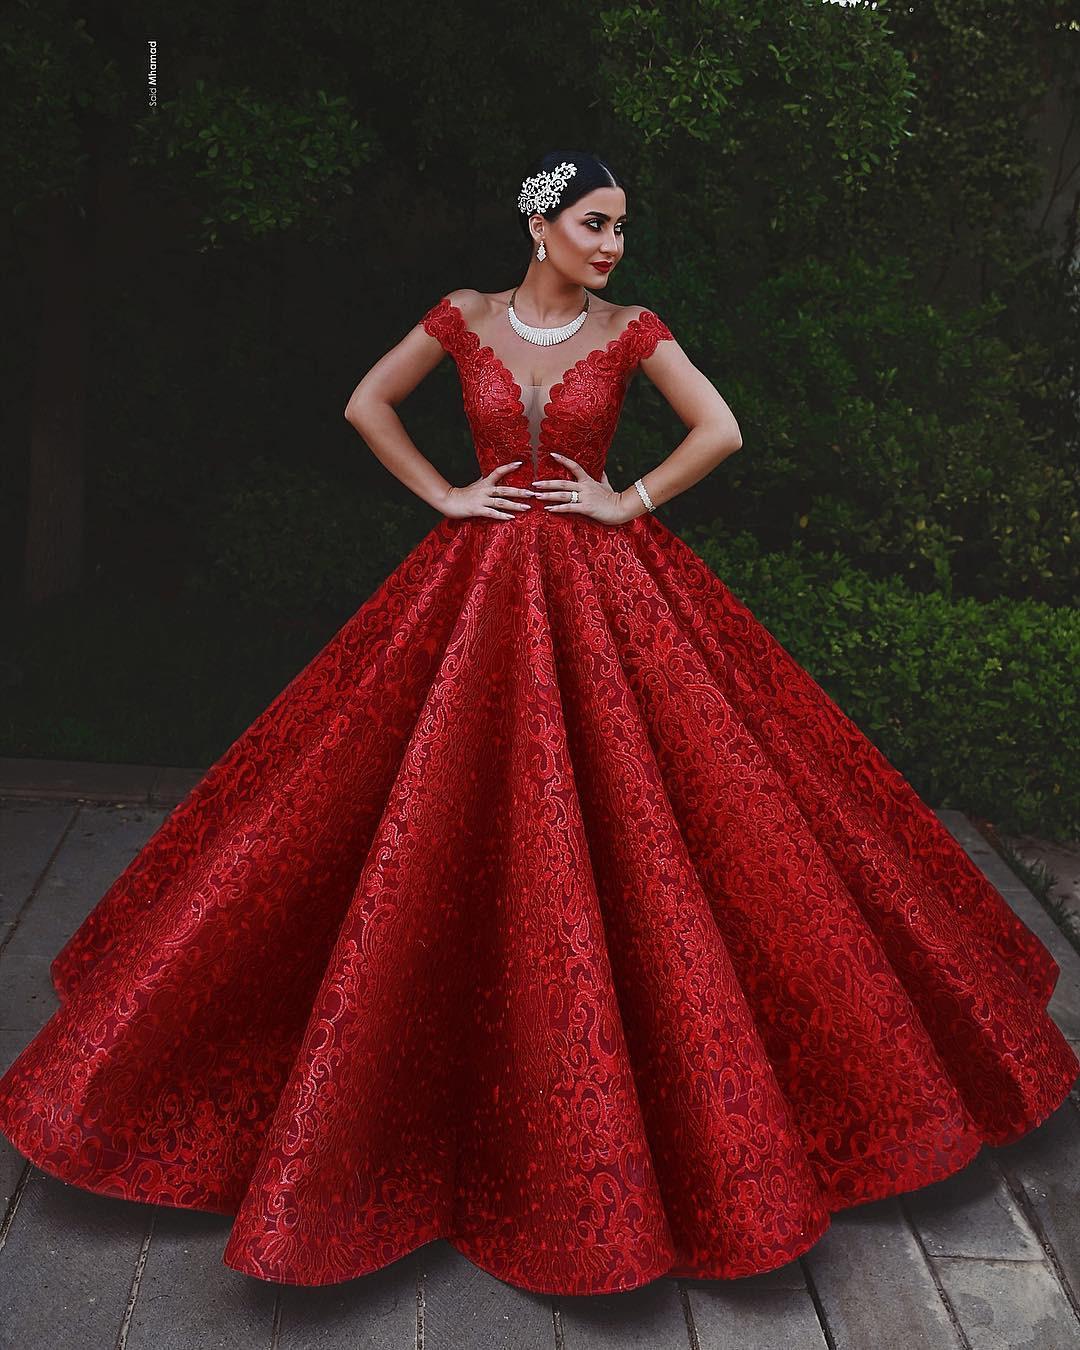 Designer Perfekt Rote Abendkleider Lang Boutique Schön Rote Abendkleider Lang Galerie